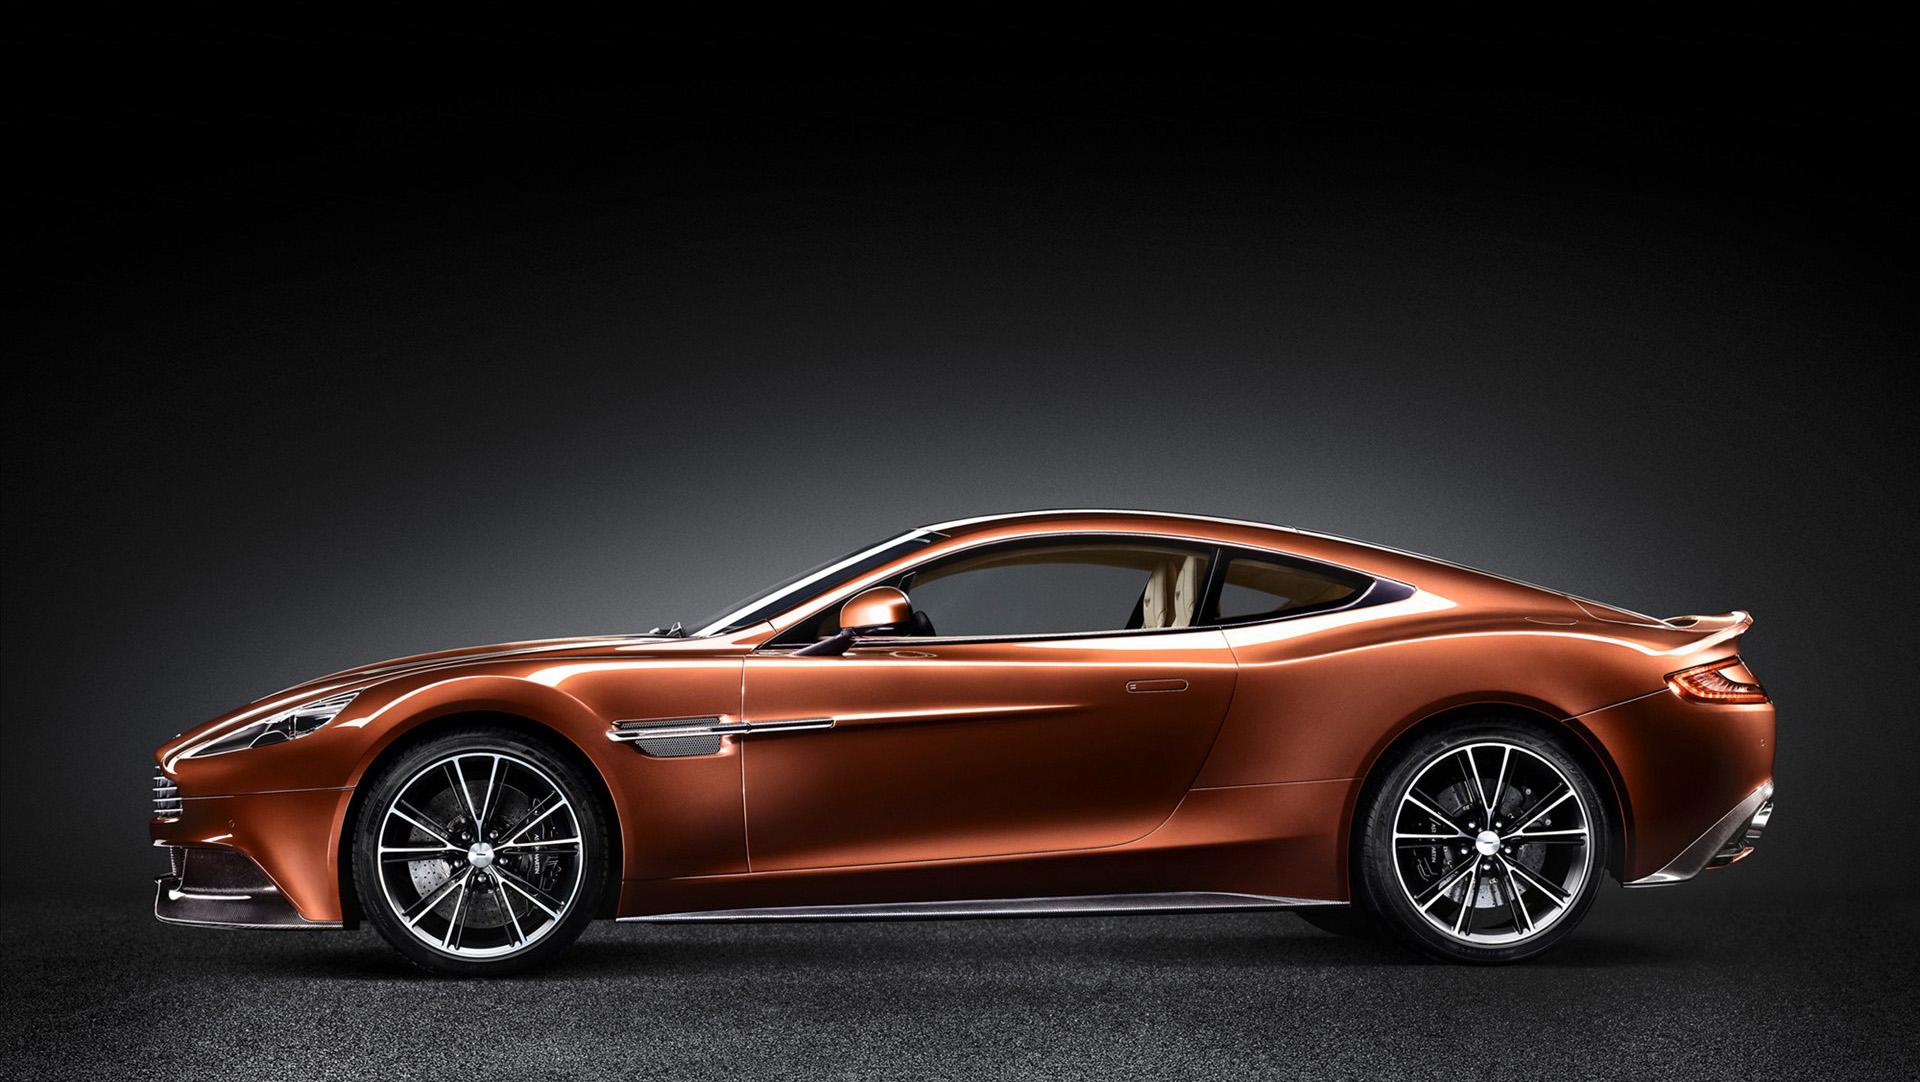 2013 Aston Martin Vanquish  Brown Safe Research Labs